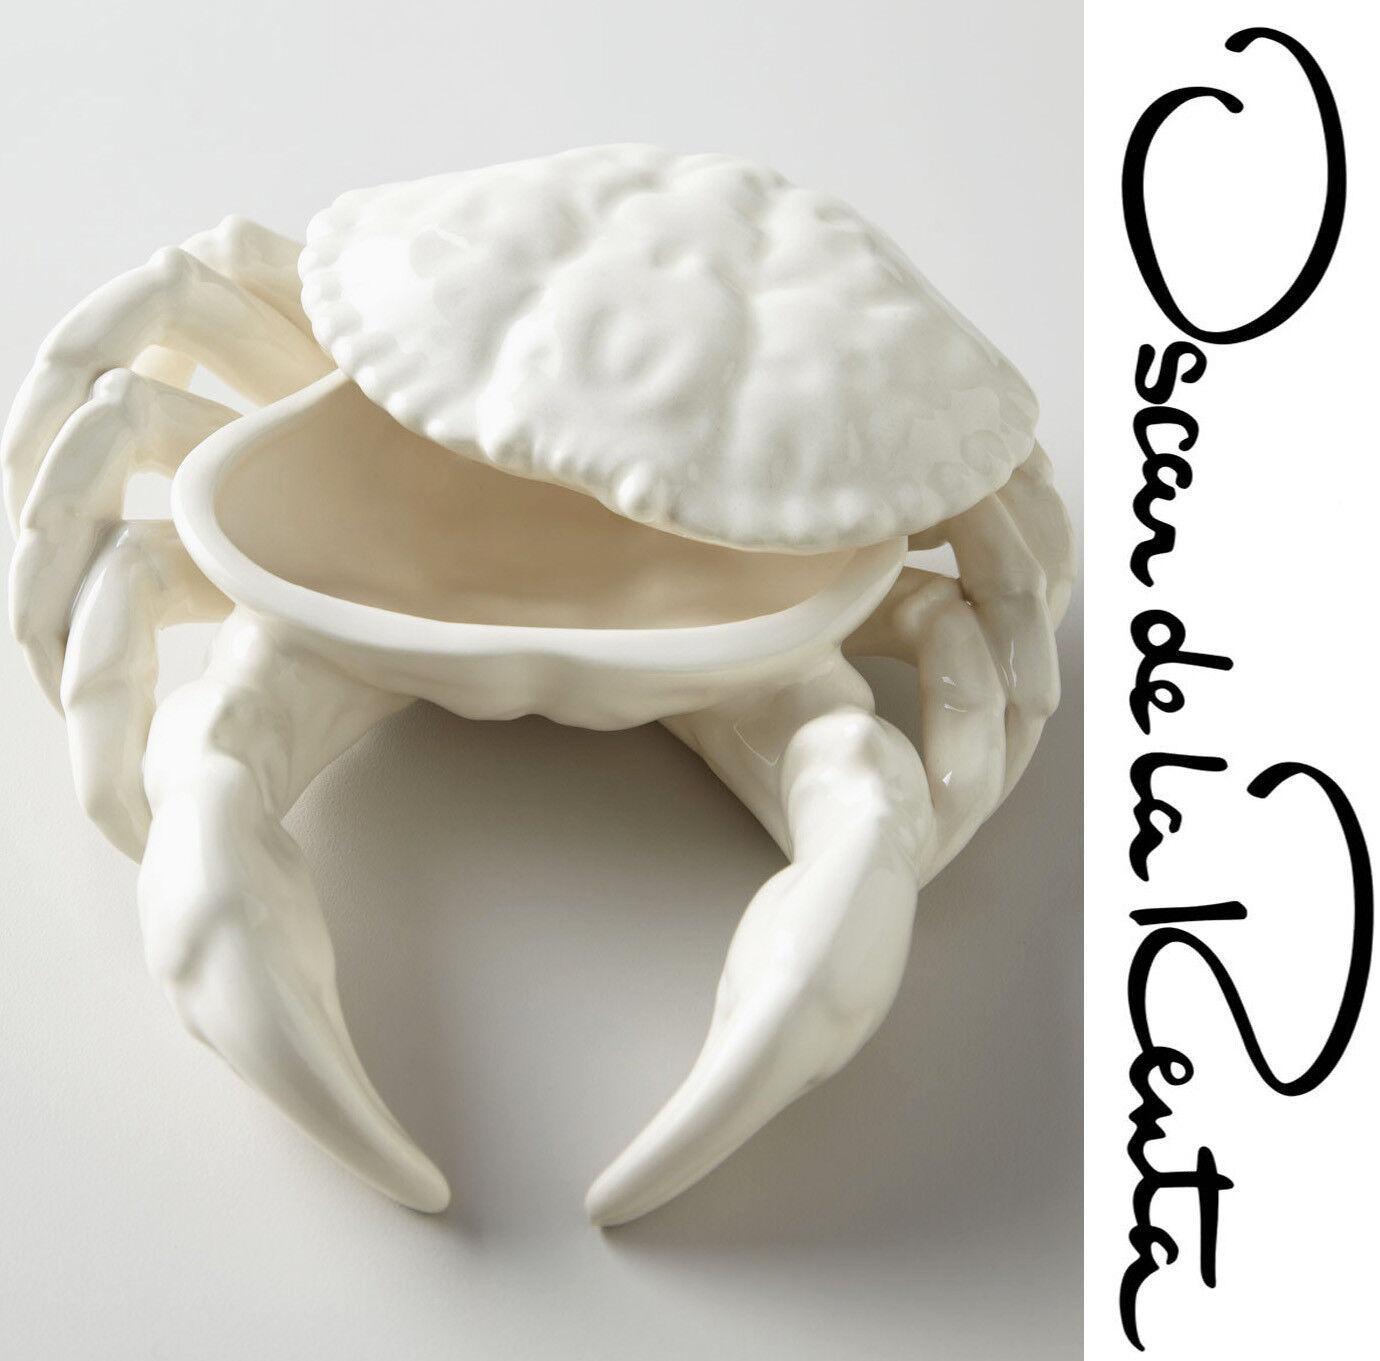 165 OSCAR DE LA RENTA Ivoire crabe condiment Server 7.5  X 7.5  Handcrafted